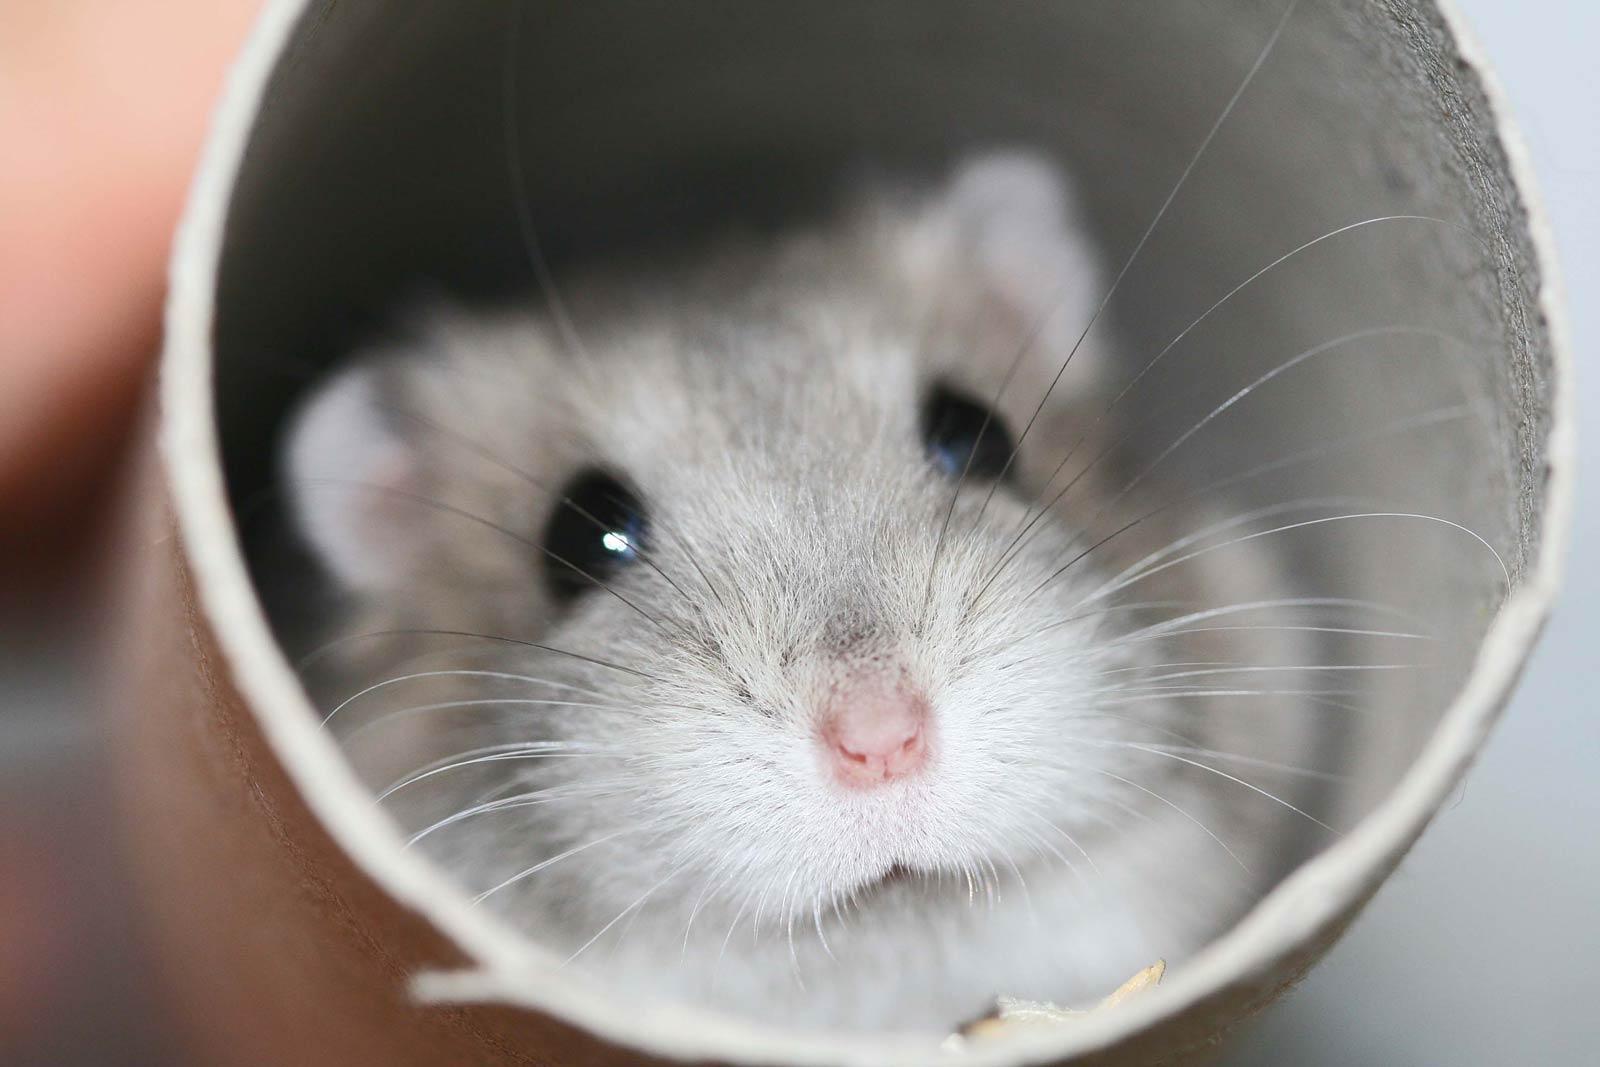 Hamster&amp;amp;plus;images